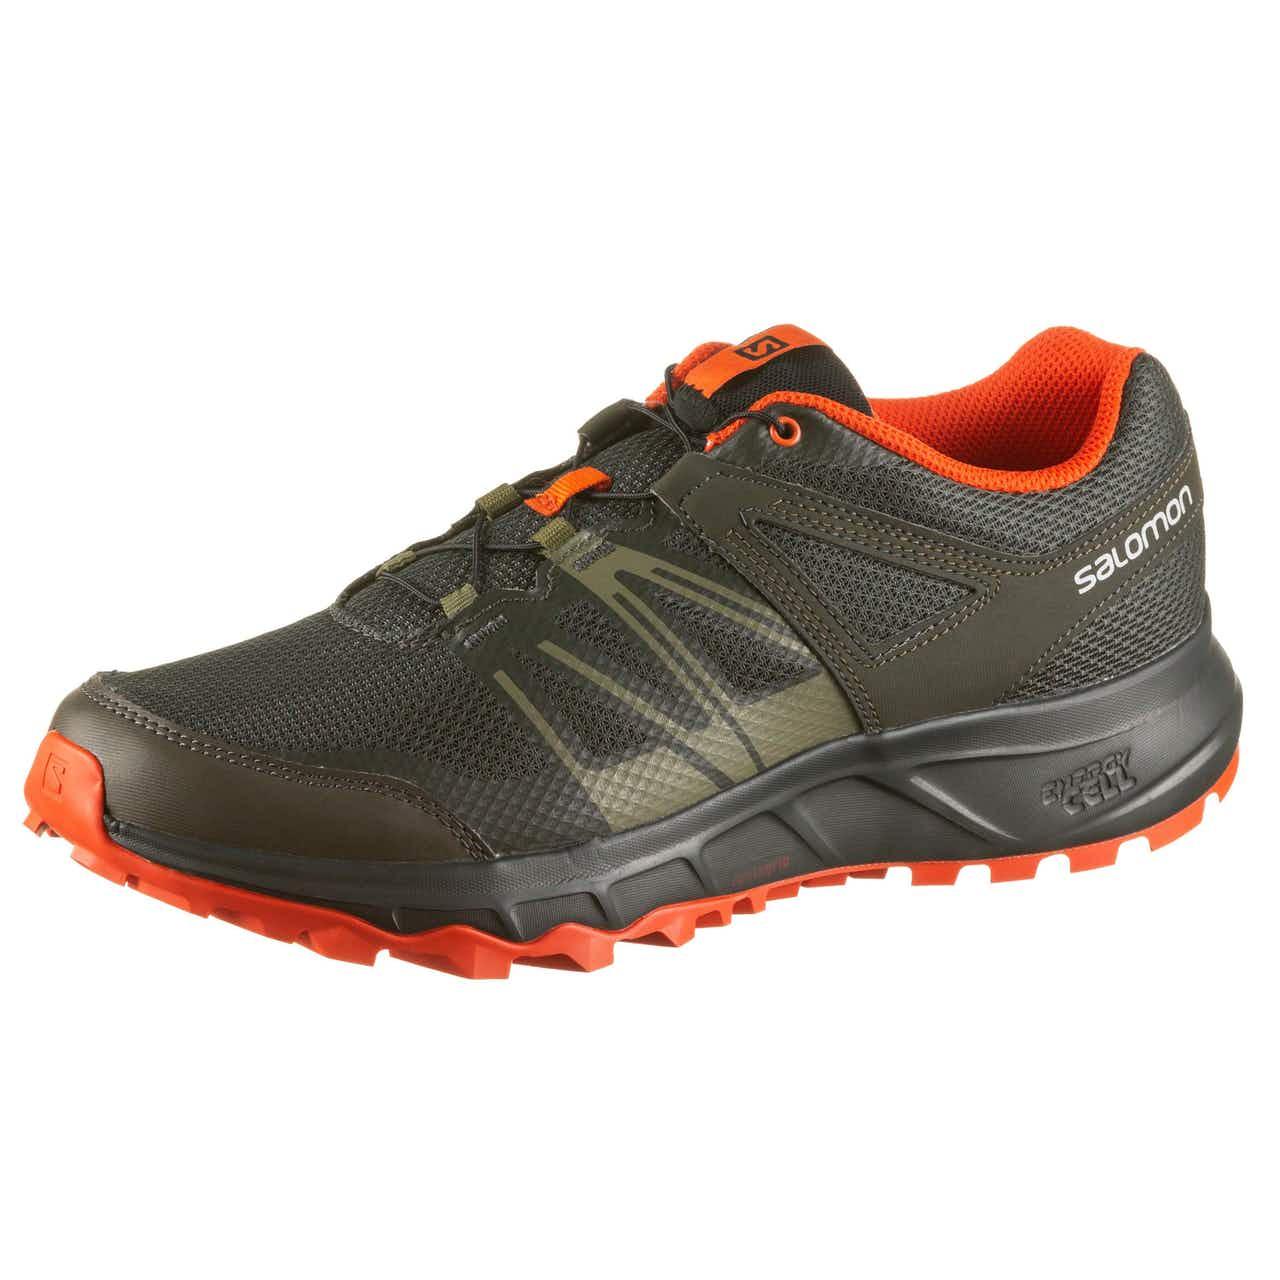 Salomon SAVICA TRAIL Trailrunning Schuhe Herren